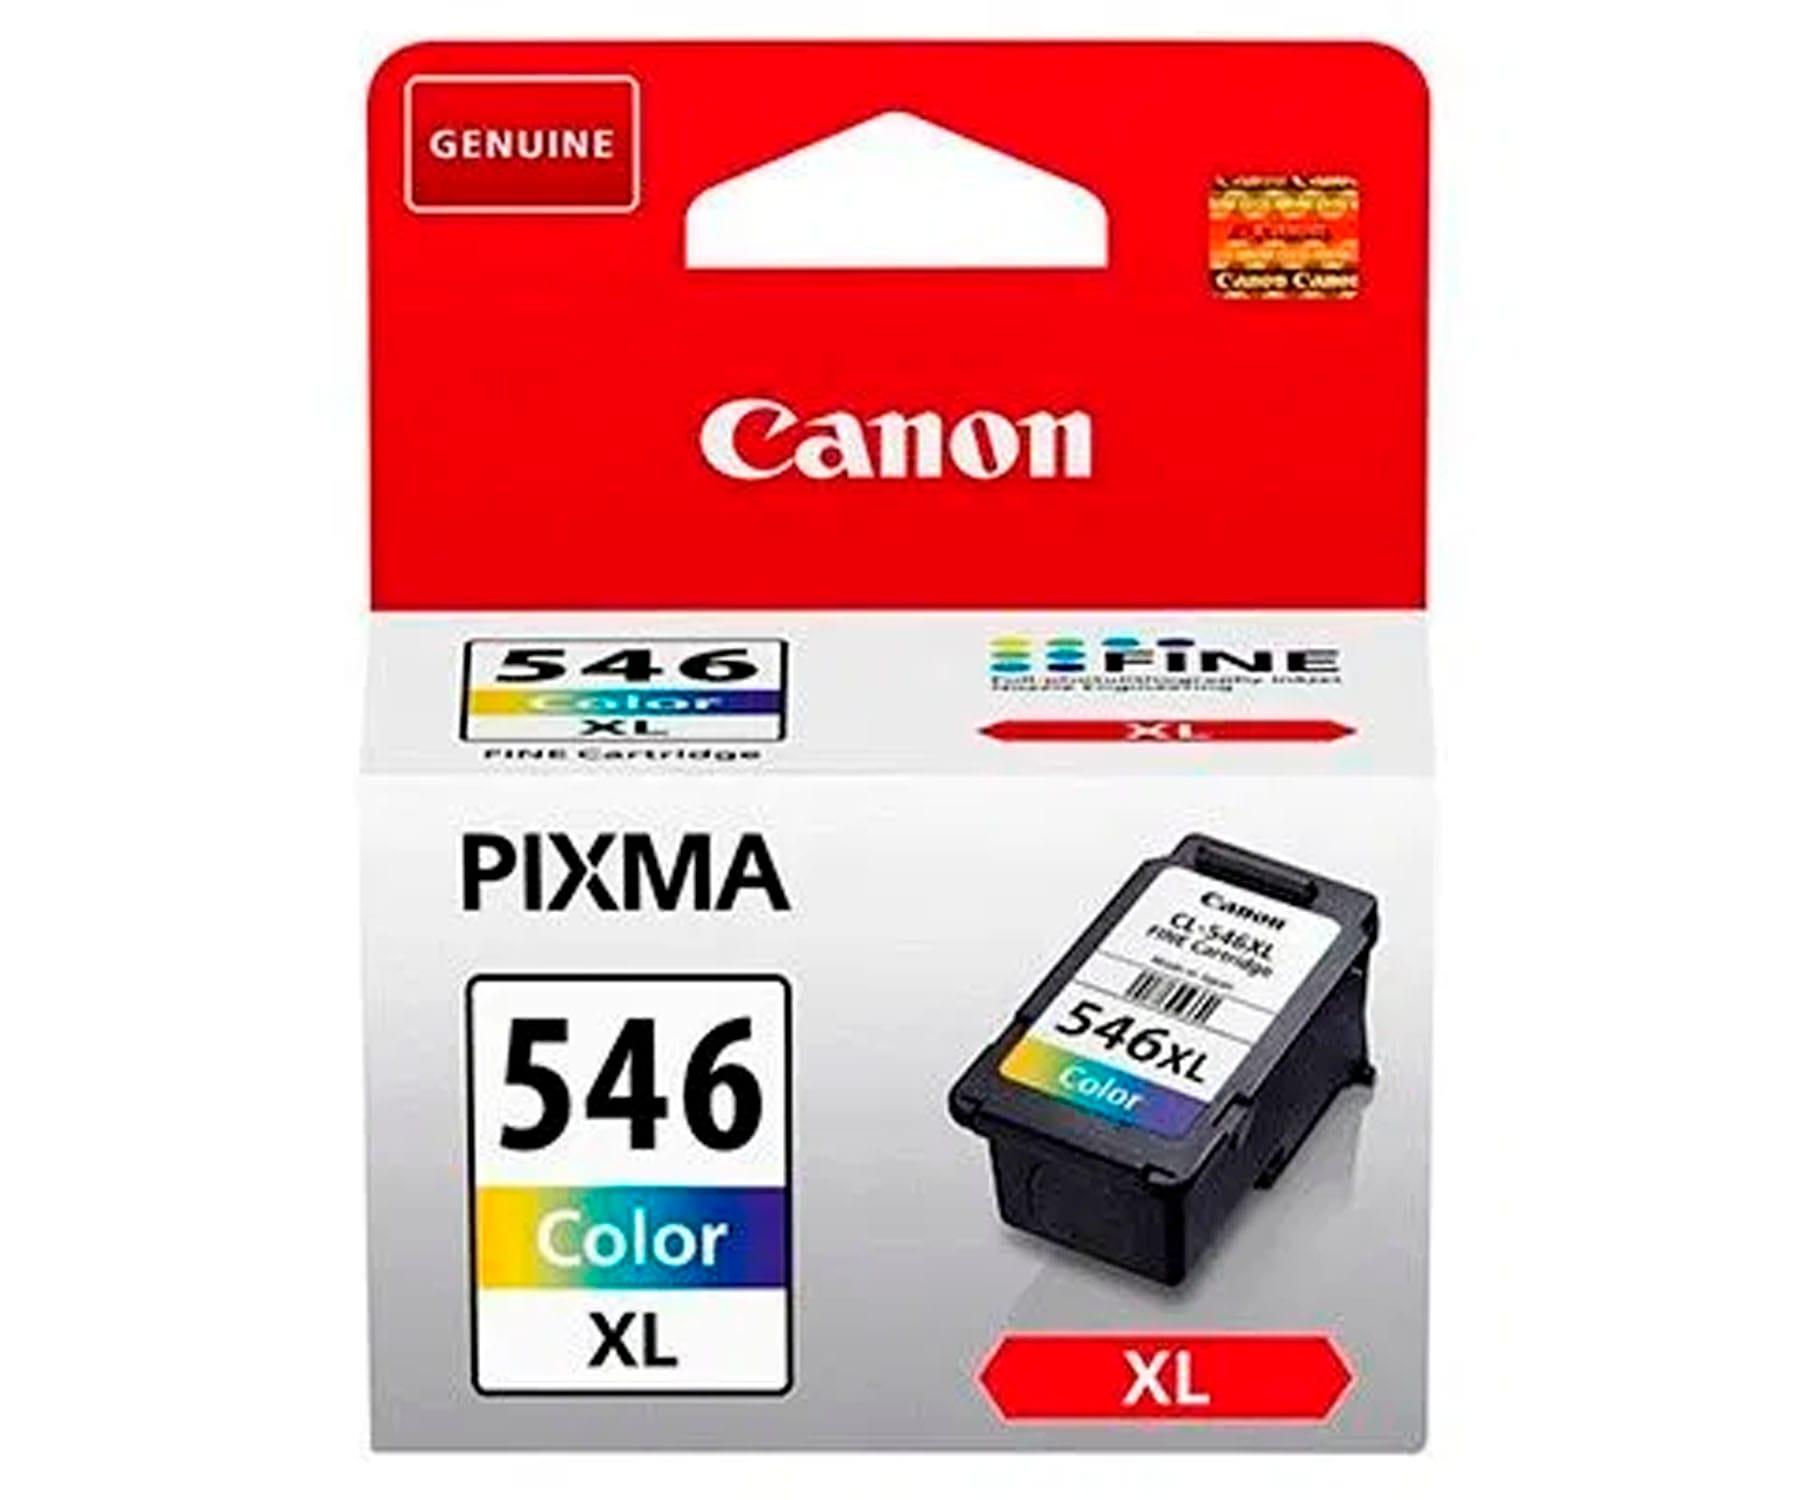 CANON CL-546 XL TRICOLOR CARTUCHO DE TINTA 13ml FINE PIXMA CIAN MAGENTA AMARILLO